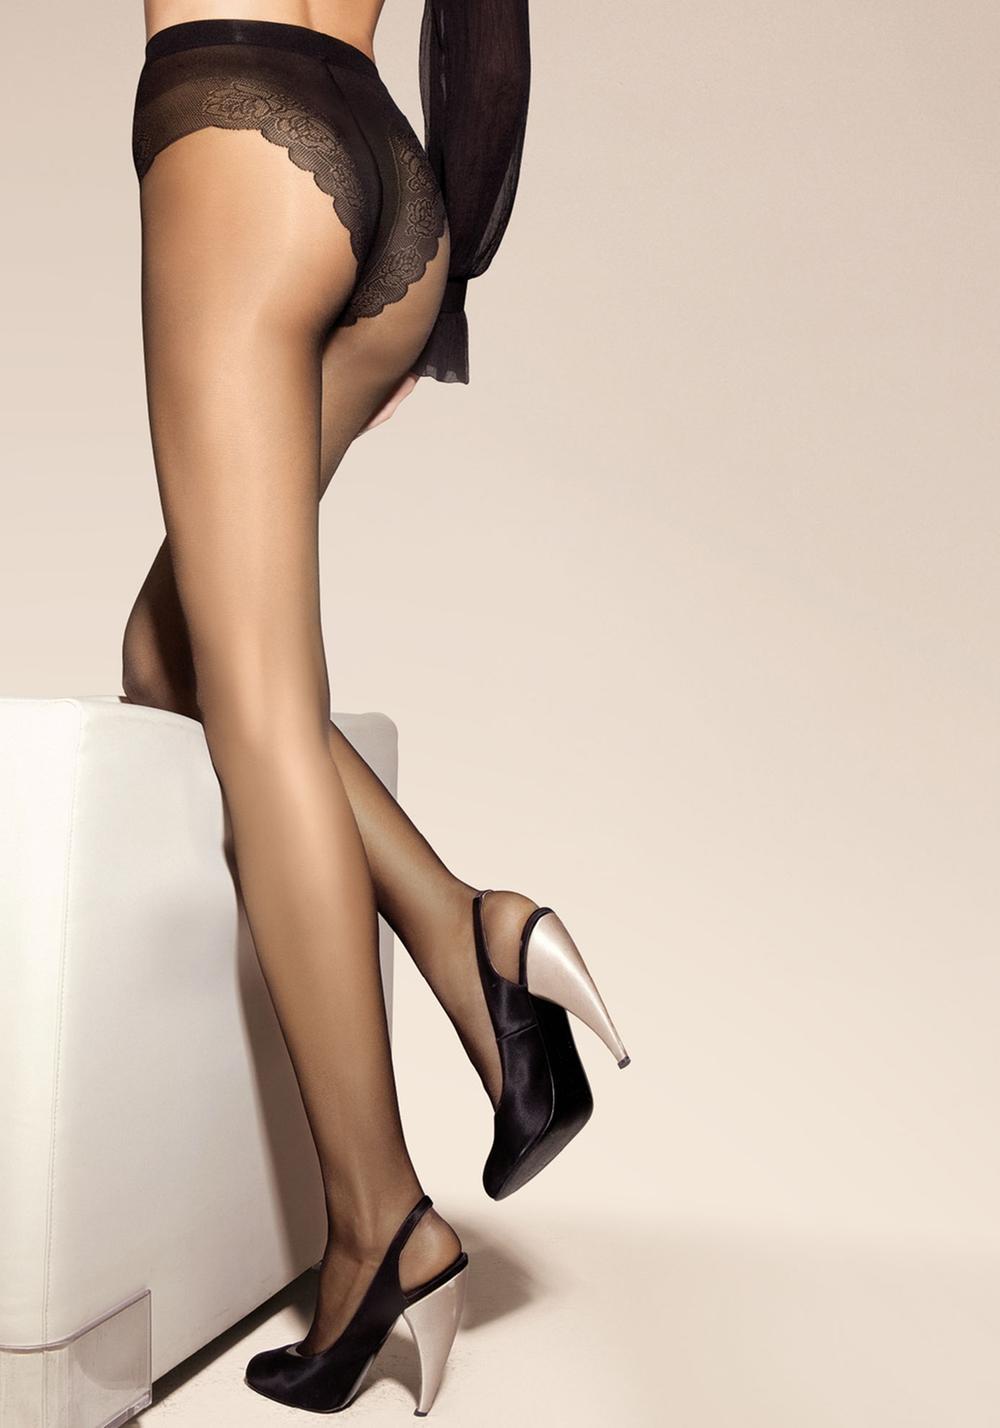 https://golden-legs.com.ua/images/stories/virtuemart/product/__upl__Images__classici__STYLE_20.jpg_W1000.jpg